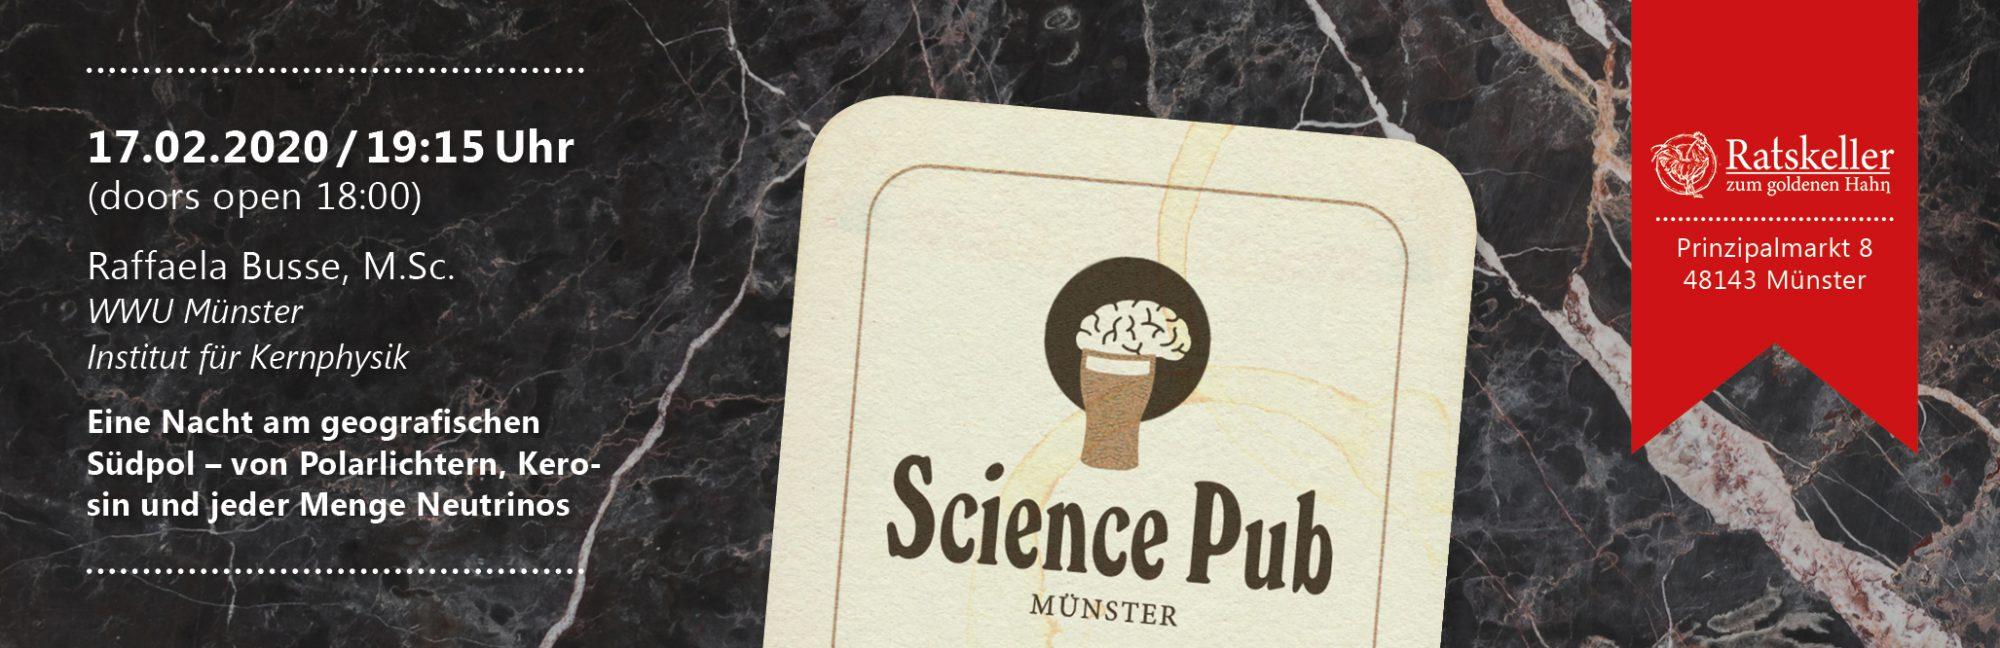 Science-Pub-Münster